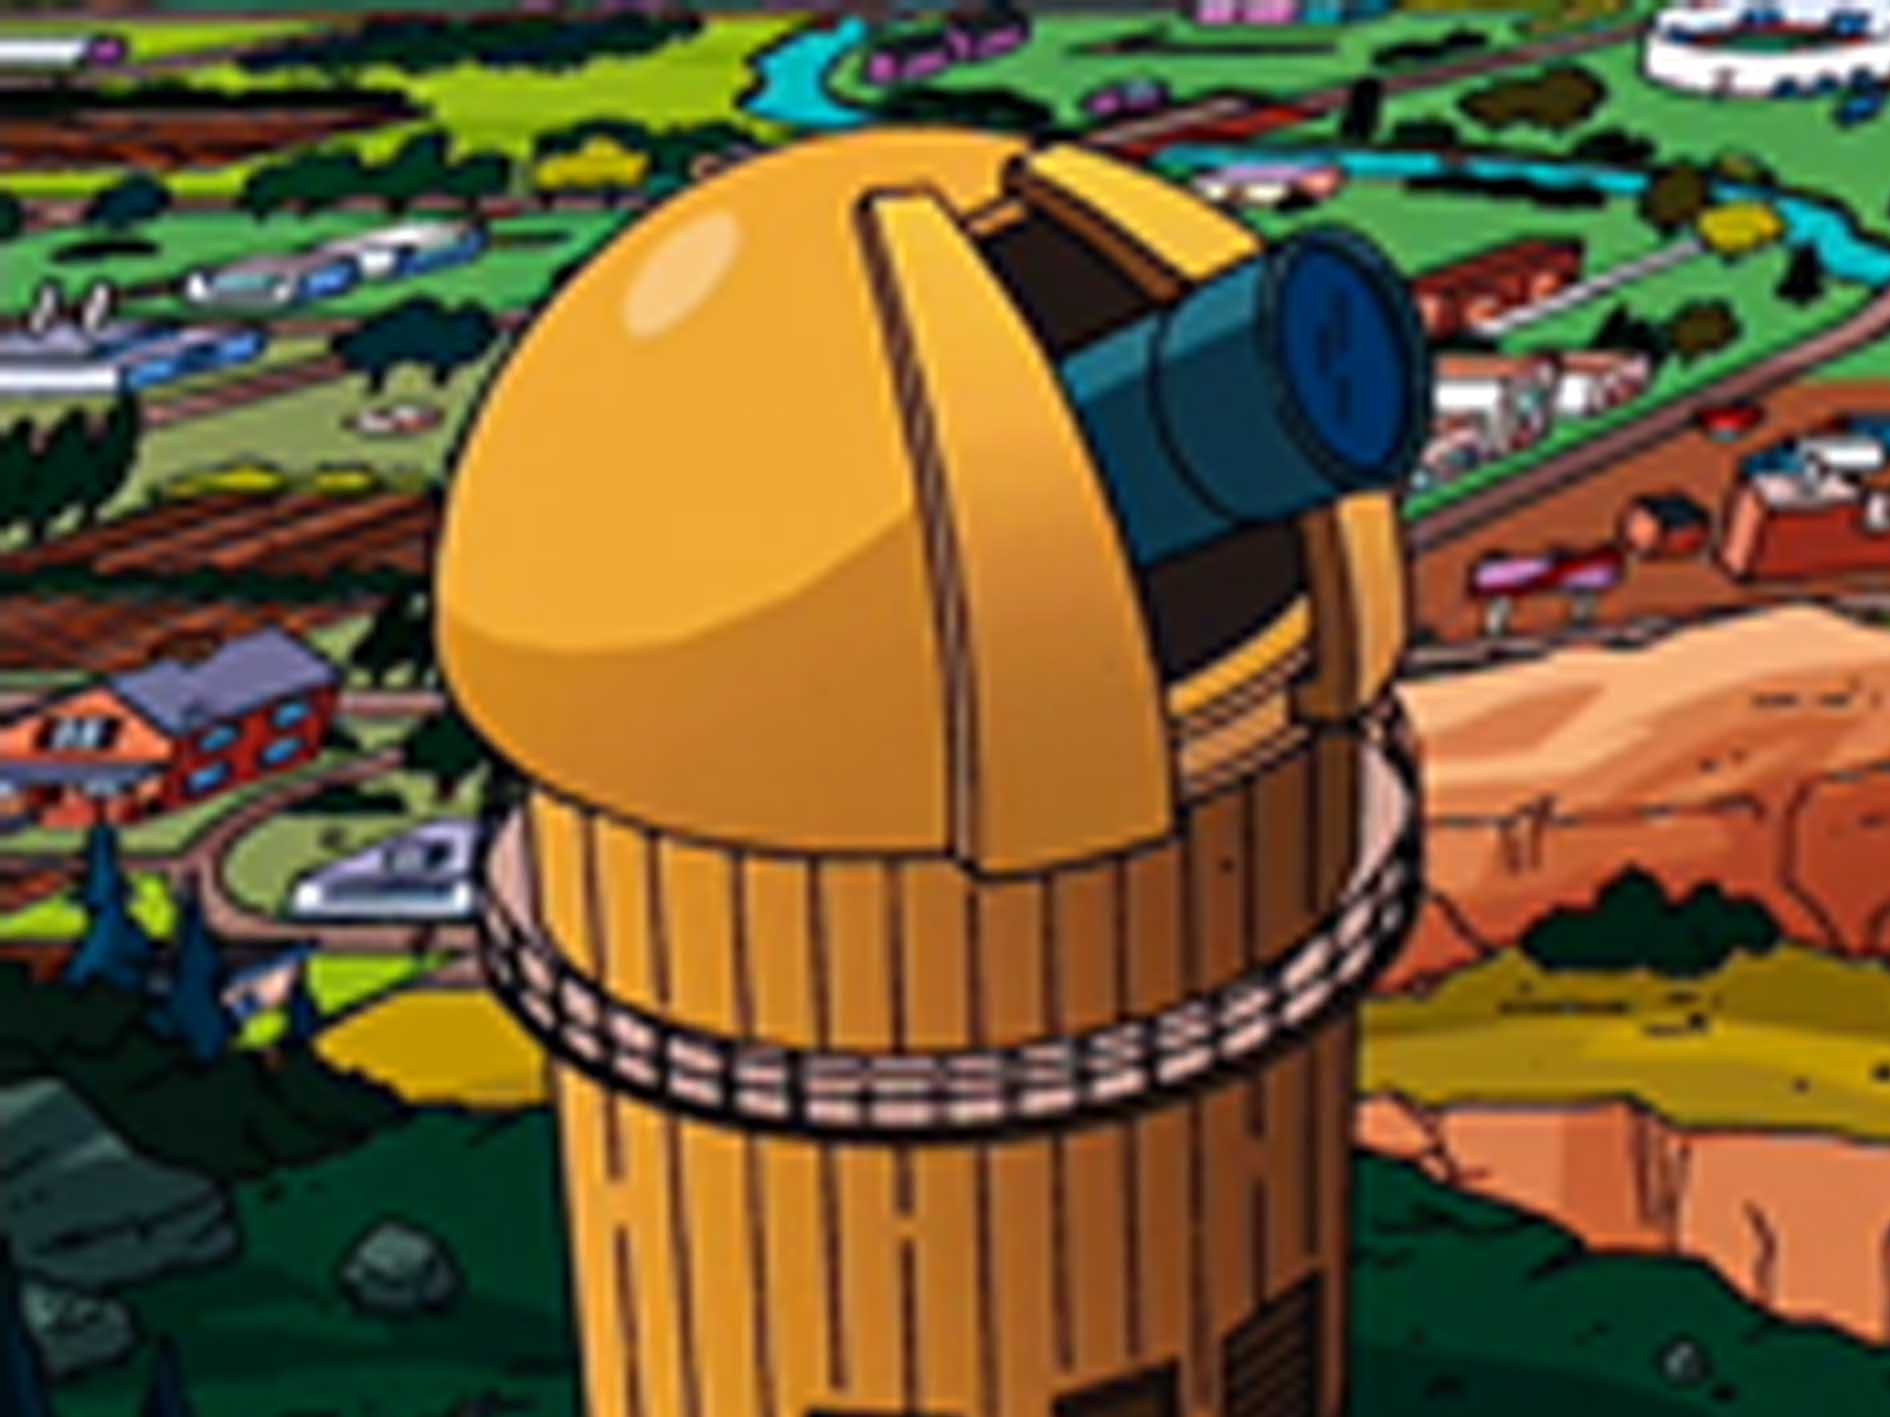 springfield observatory simpsons wiki fandom powered